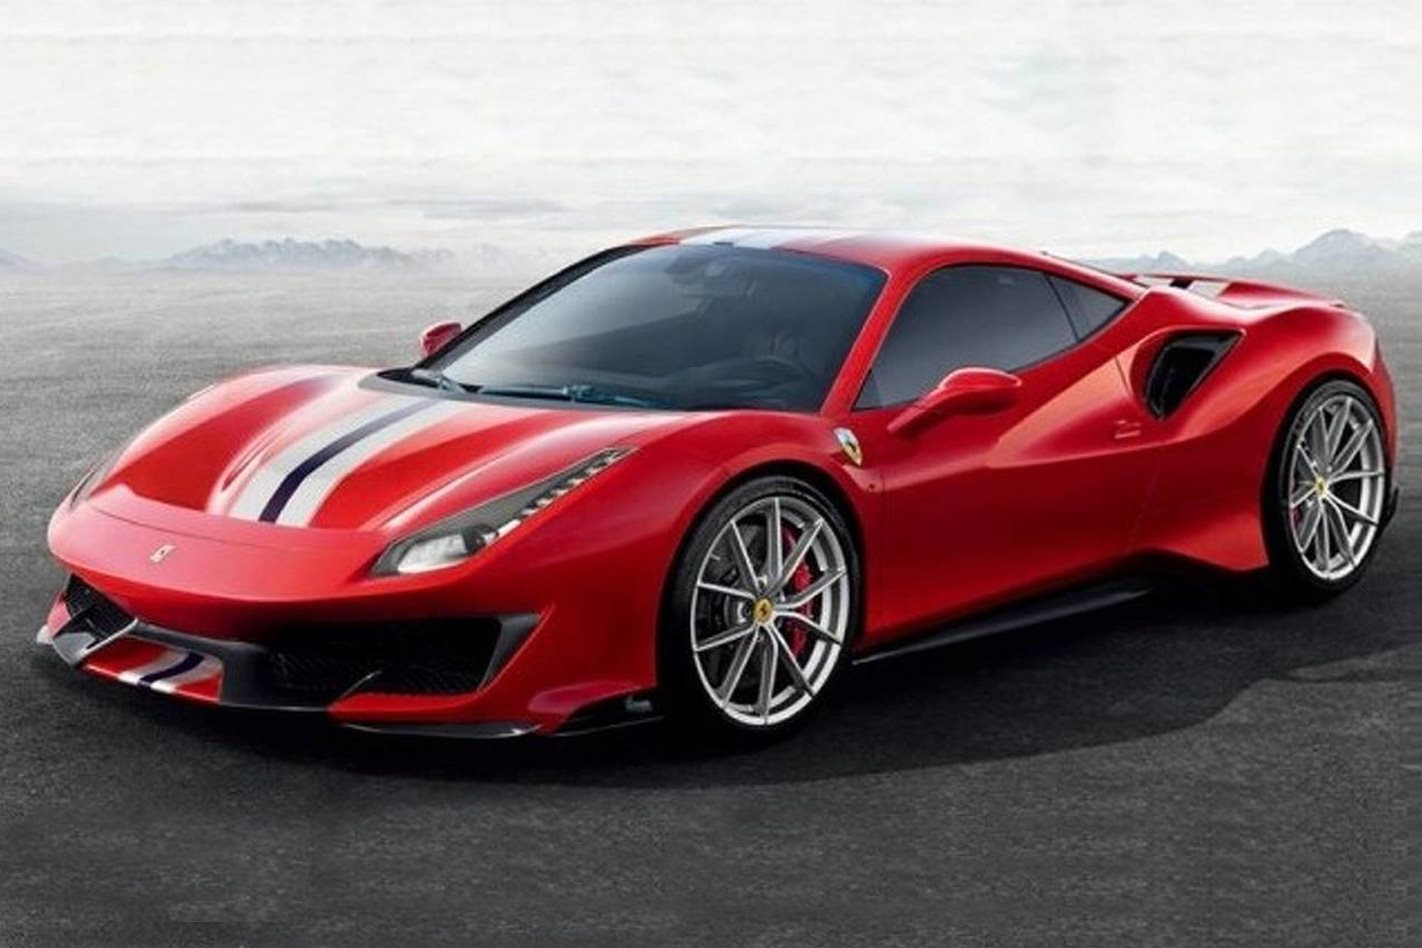 ad for mirror italia z cover red ferrari stretch with car pockets